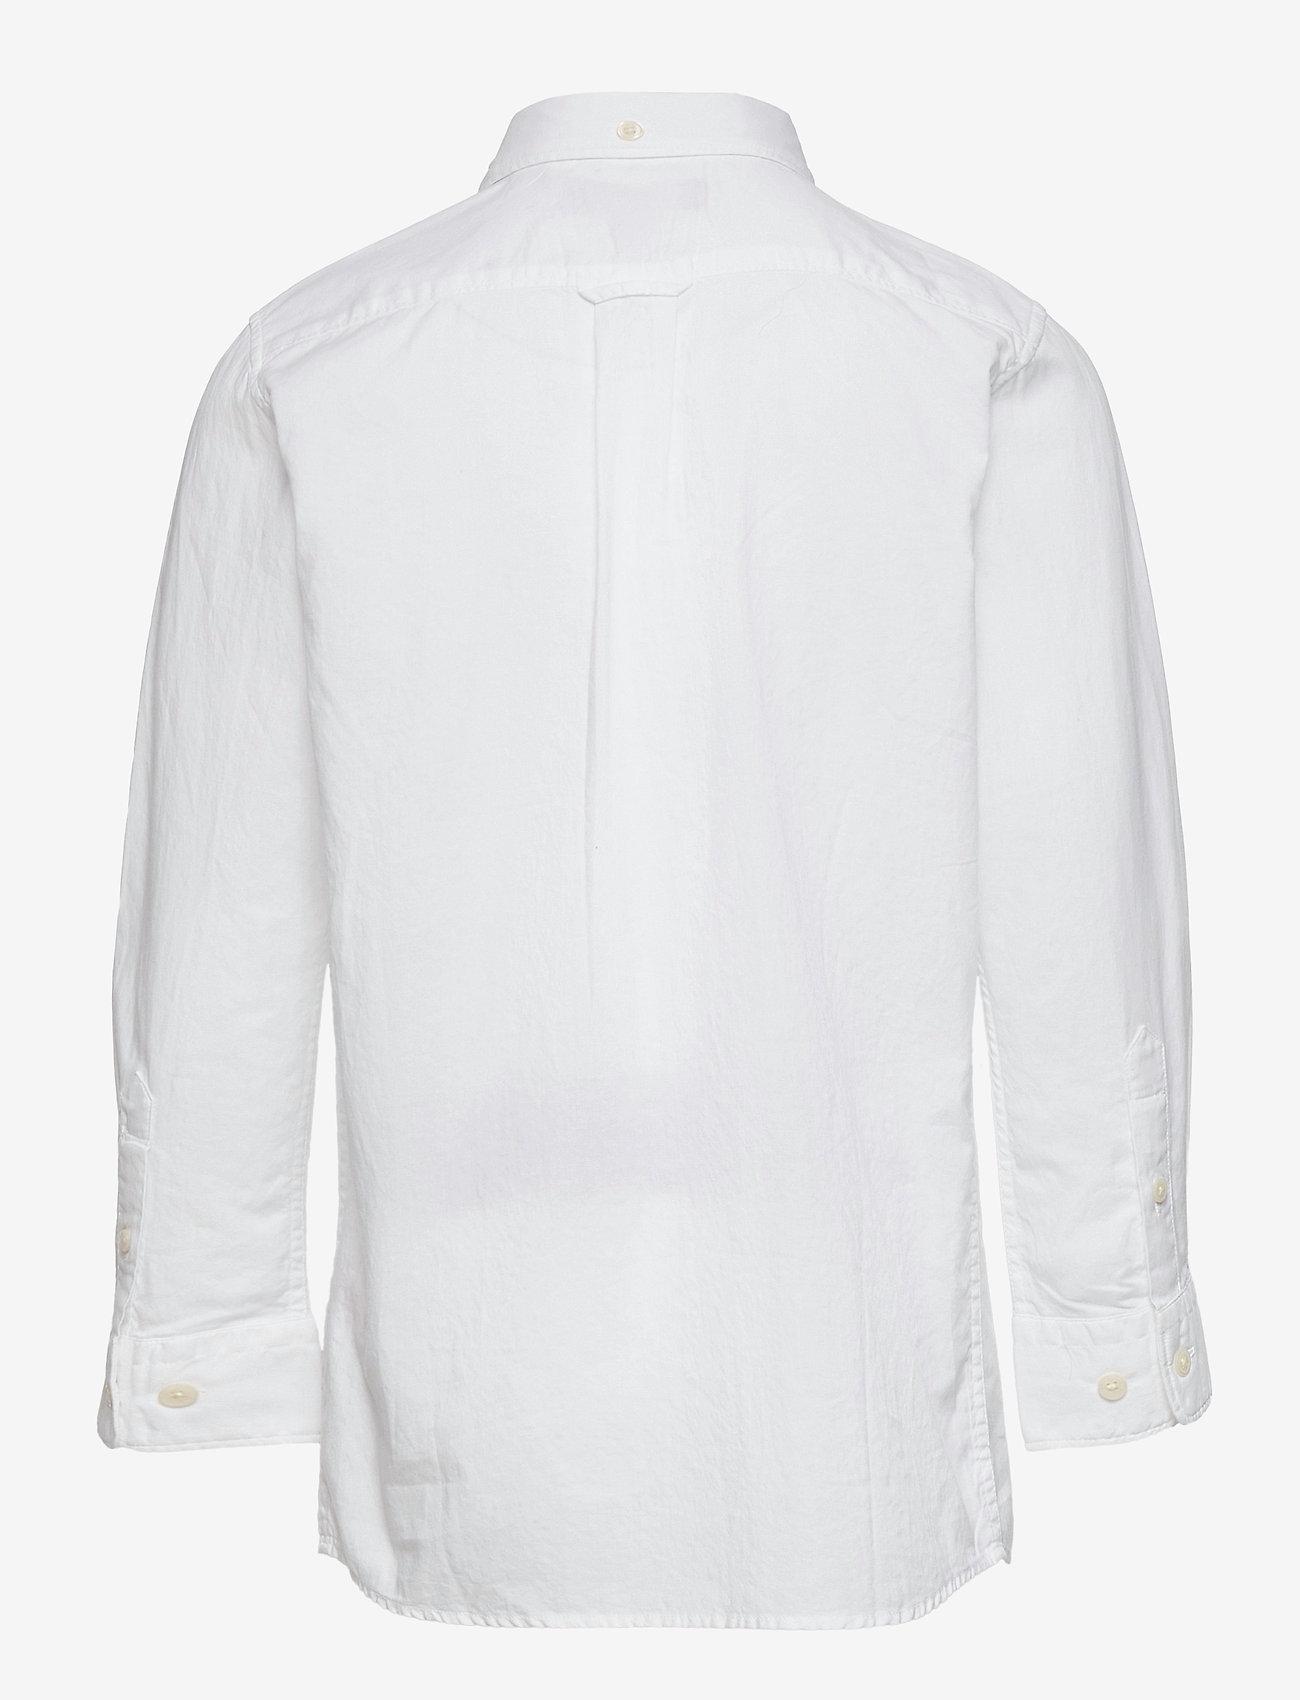 GANT - THE ORIGINAL TWILL SHIRT - overhemden - white - 1